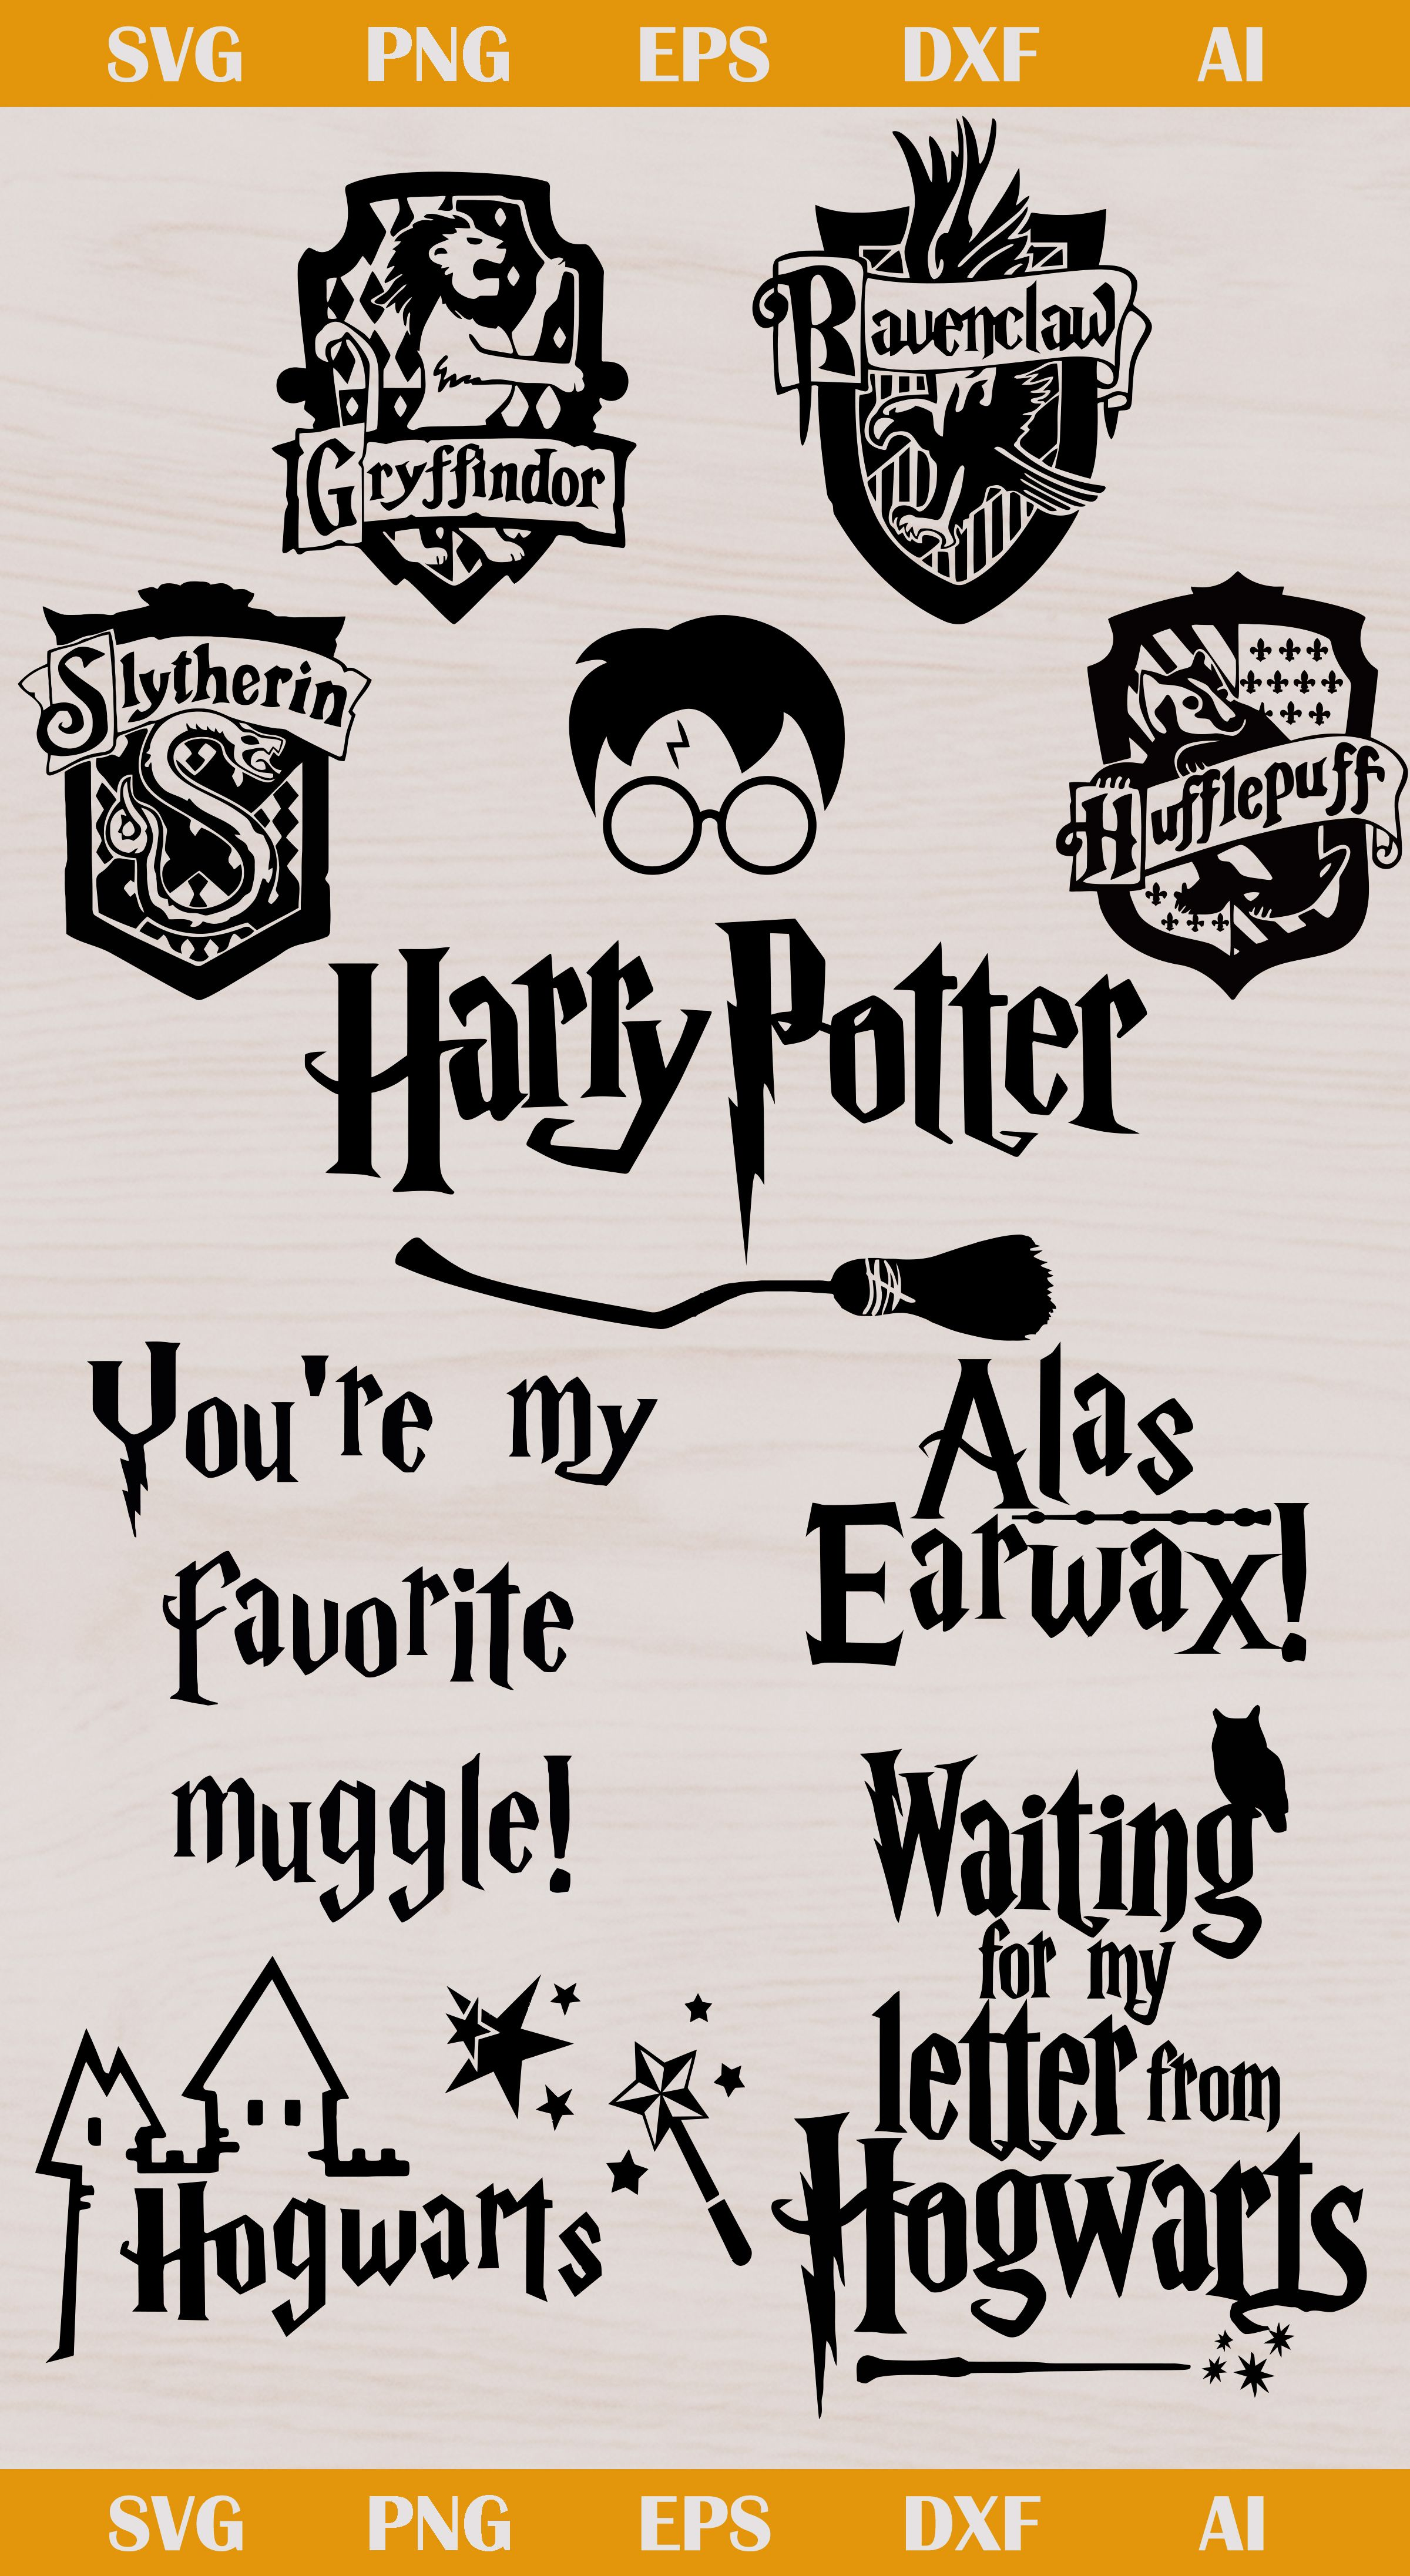 Free Harry Potter Svg Files : harry, potter, files, Harry, Potter, Cricut,, Clipart,, Silhouette, Silhouette,, Cricut